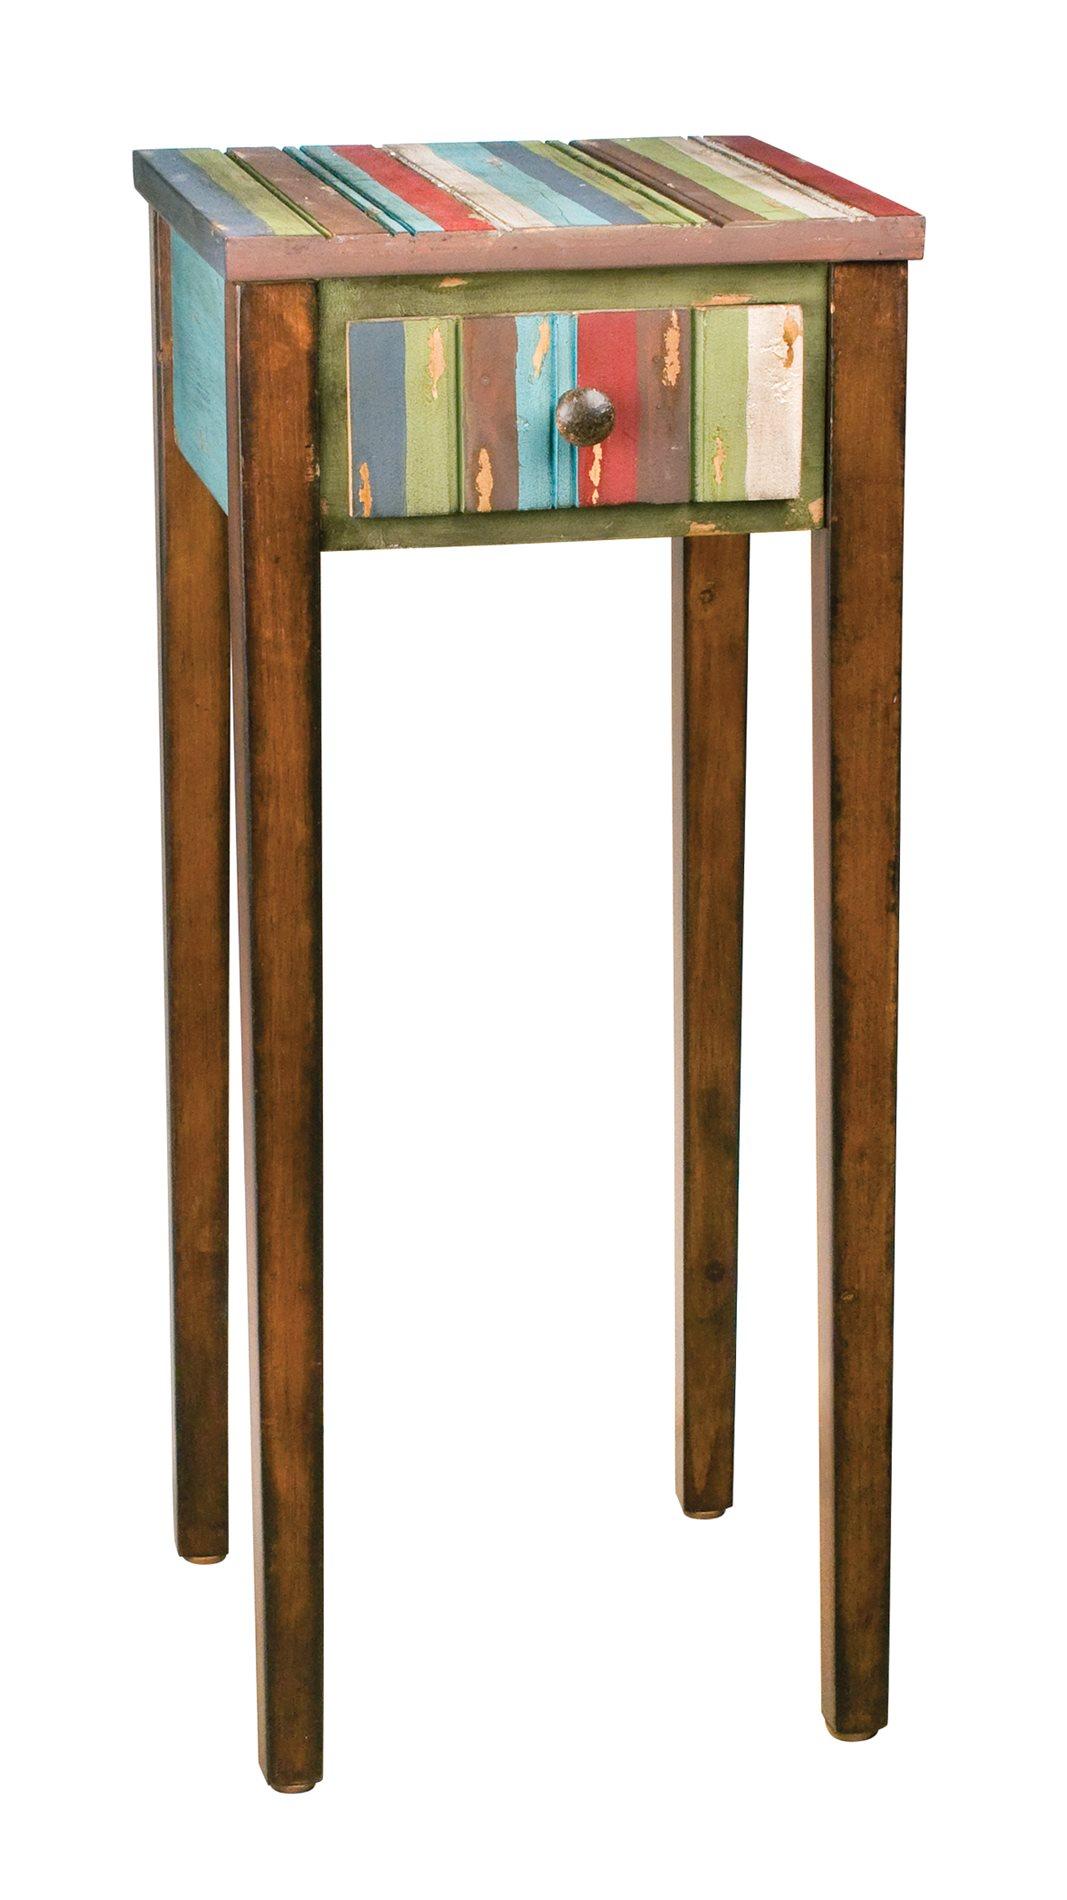 sterling industries 51 3080 ribbon night stand sti 51 3080. Black Bedroom Furniture Sets. Home Design Ideas